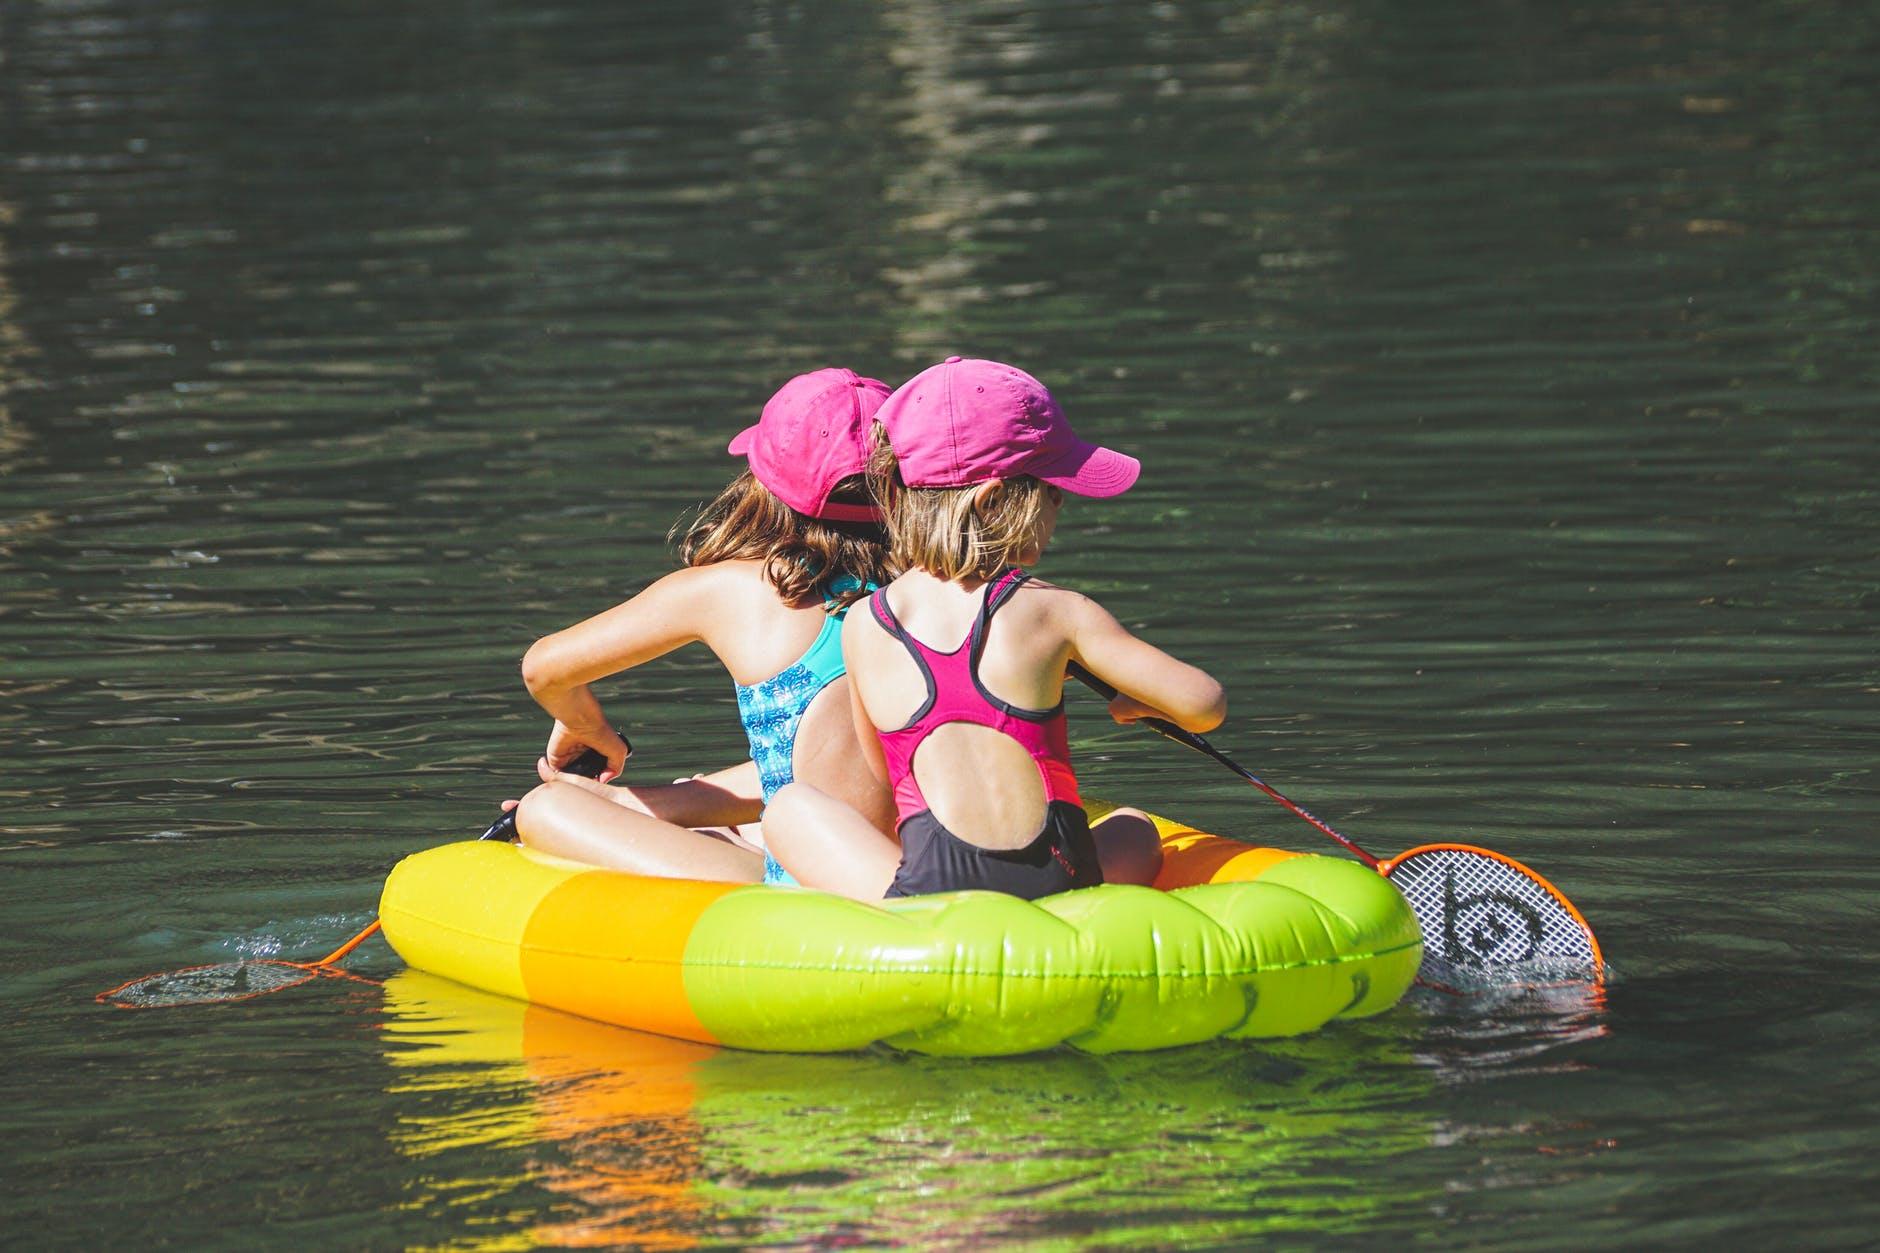 Granville water park in sydney